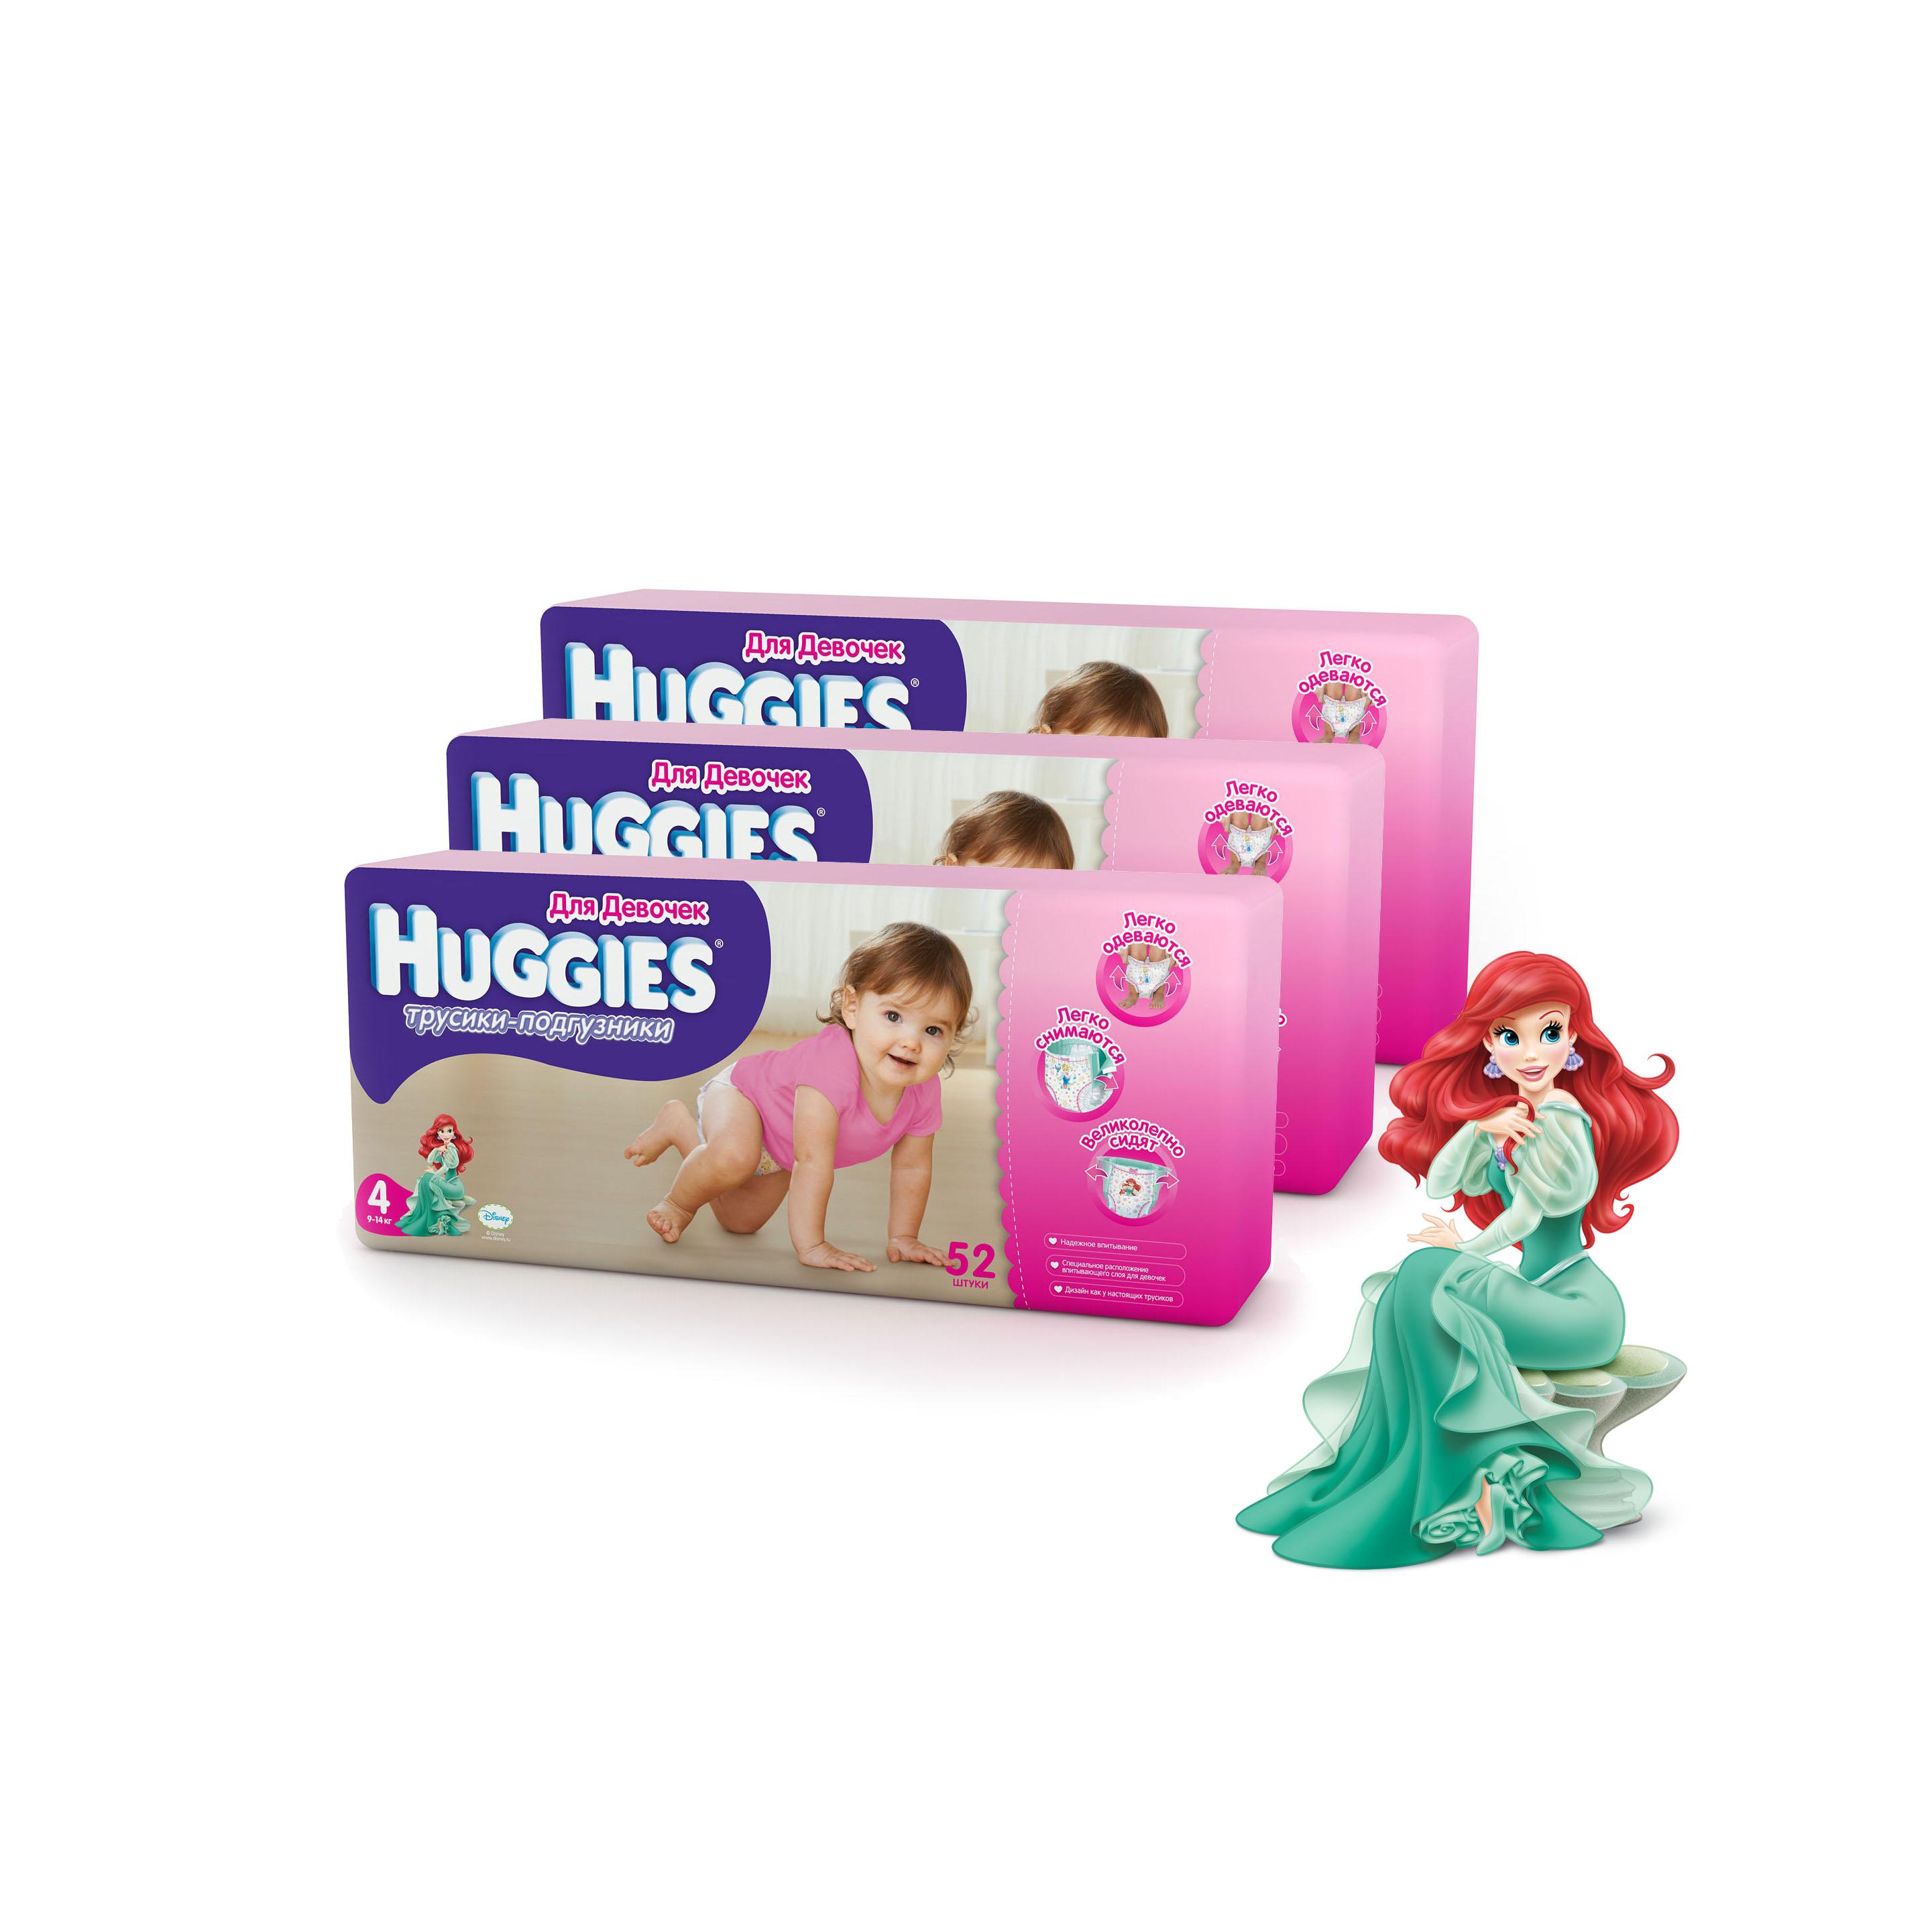 ����� �������� Huggies � 4 ��� ��������� ������� ������ 4